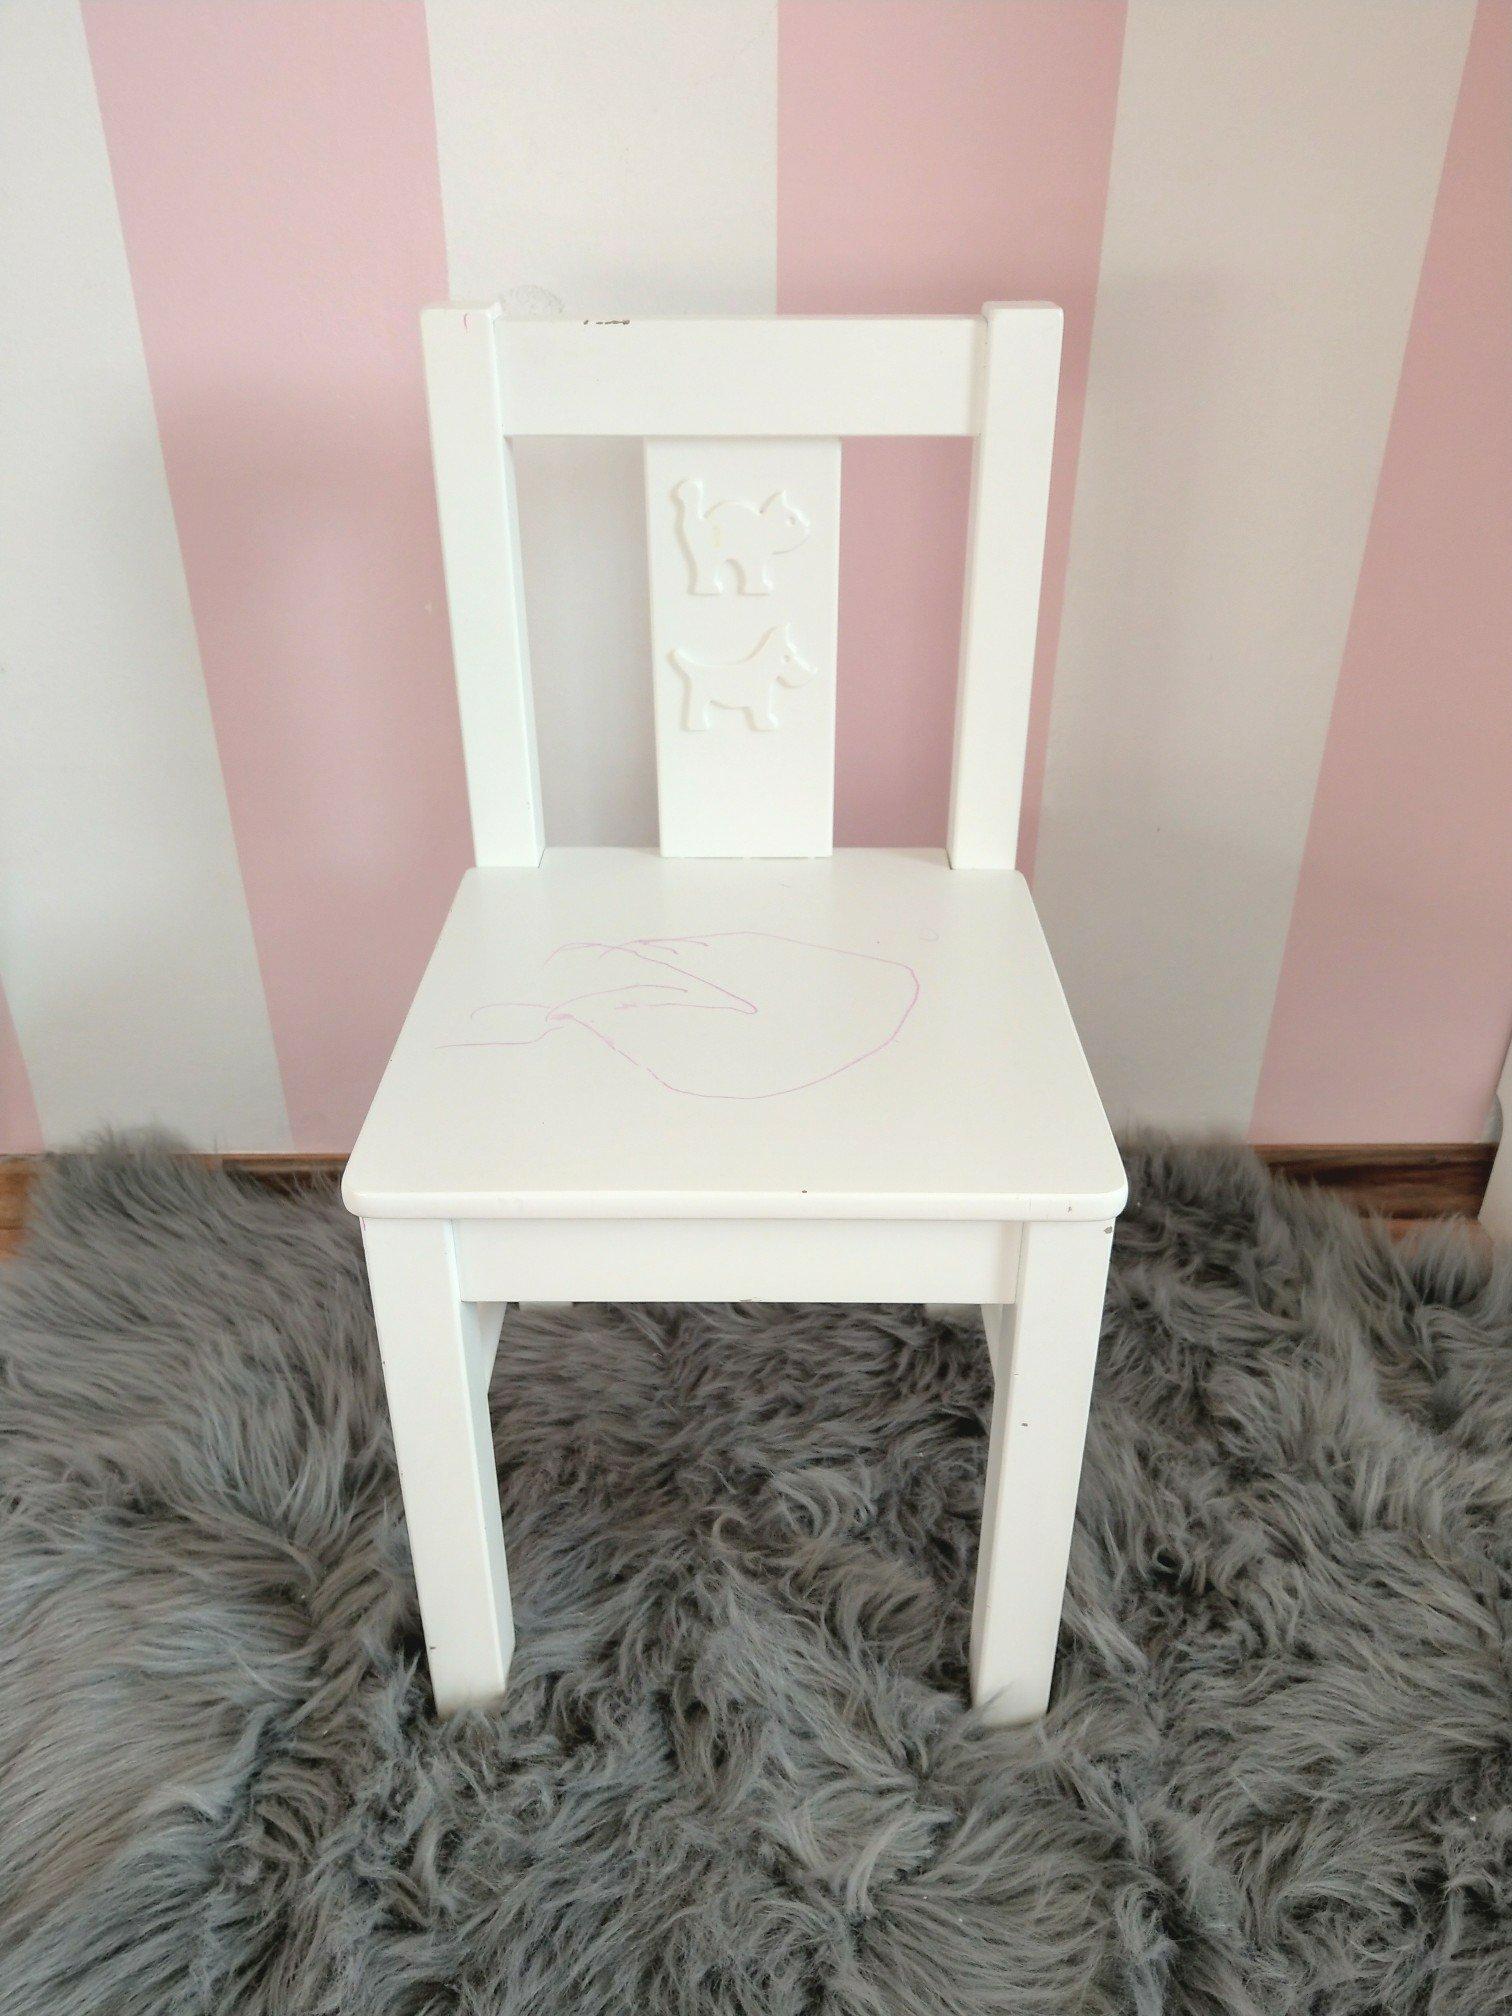 Kinderstuhl Stuhl Für Aus Ikea Dem Upcycling Diy Kritter Einhorn zMpVUS